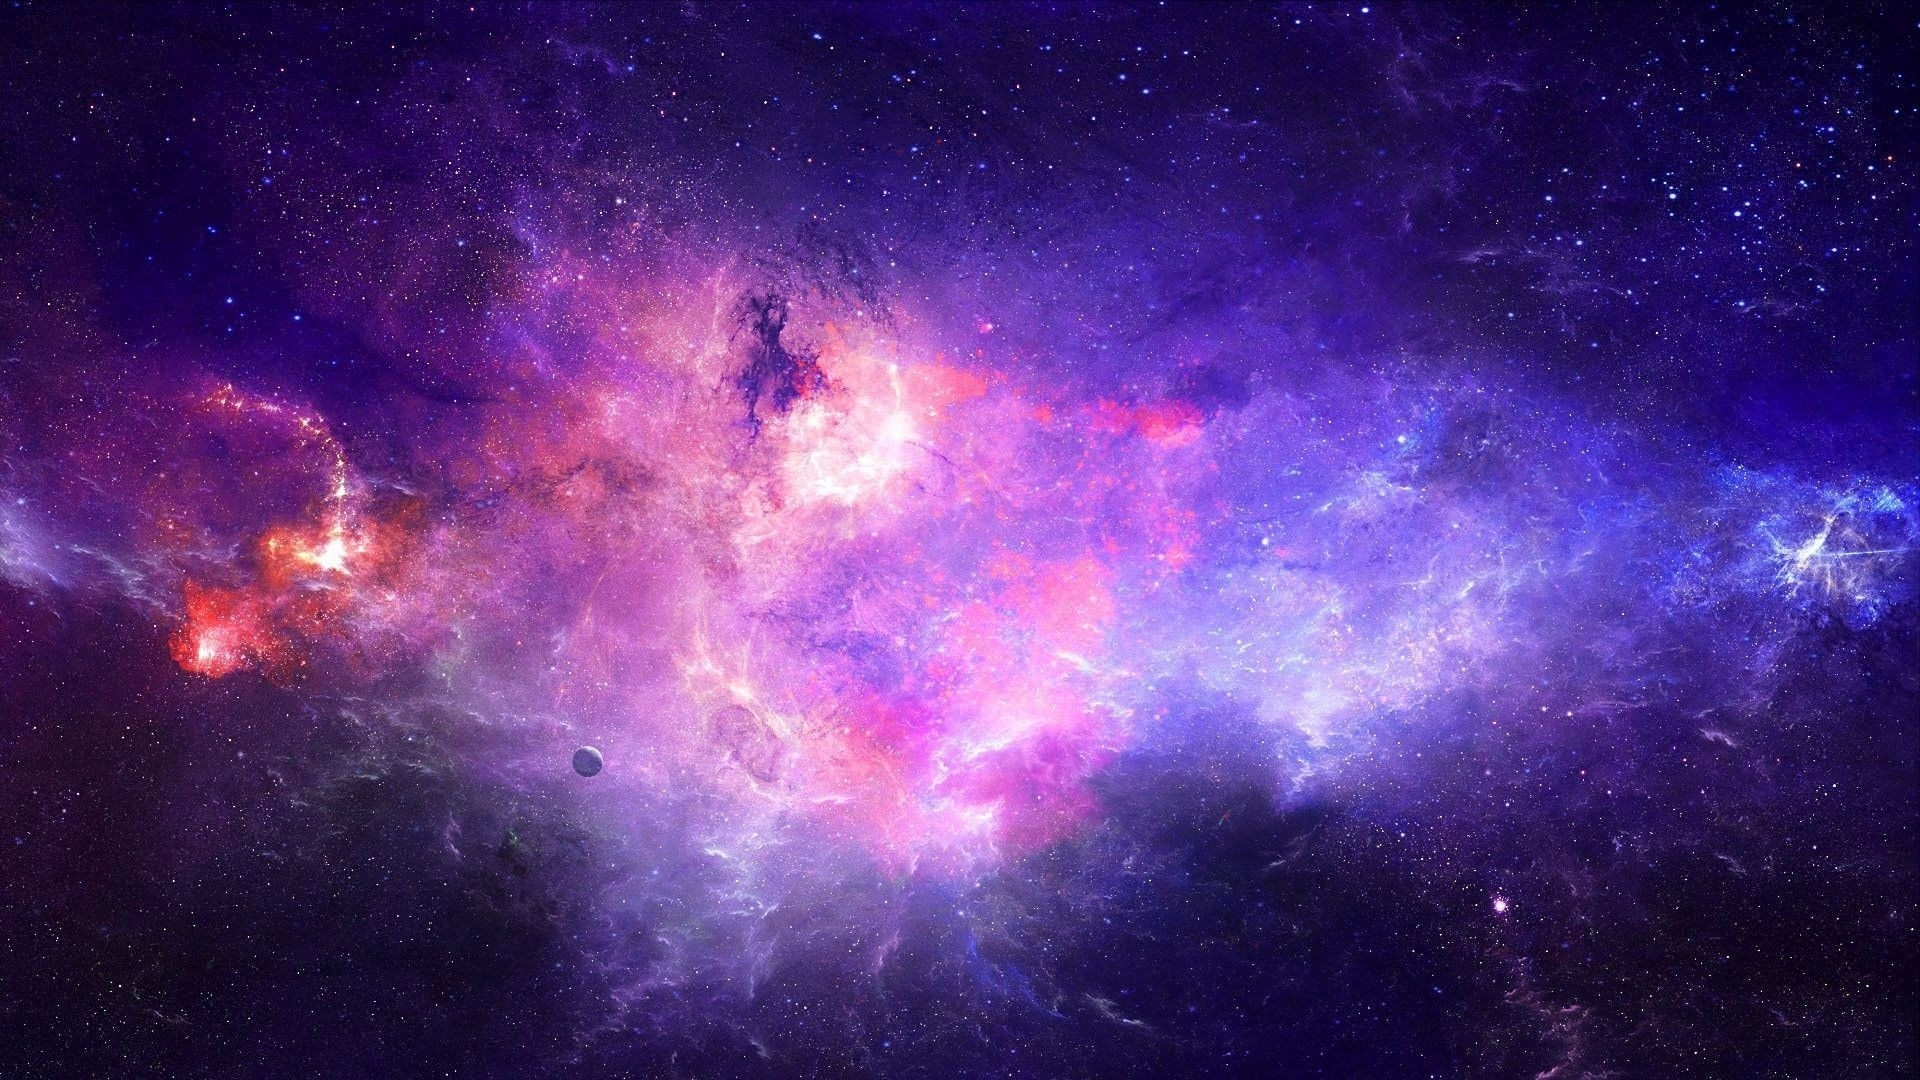 wallpaper galaxy ·① download free beautiful high resolution